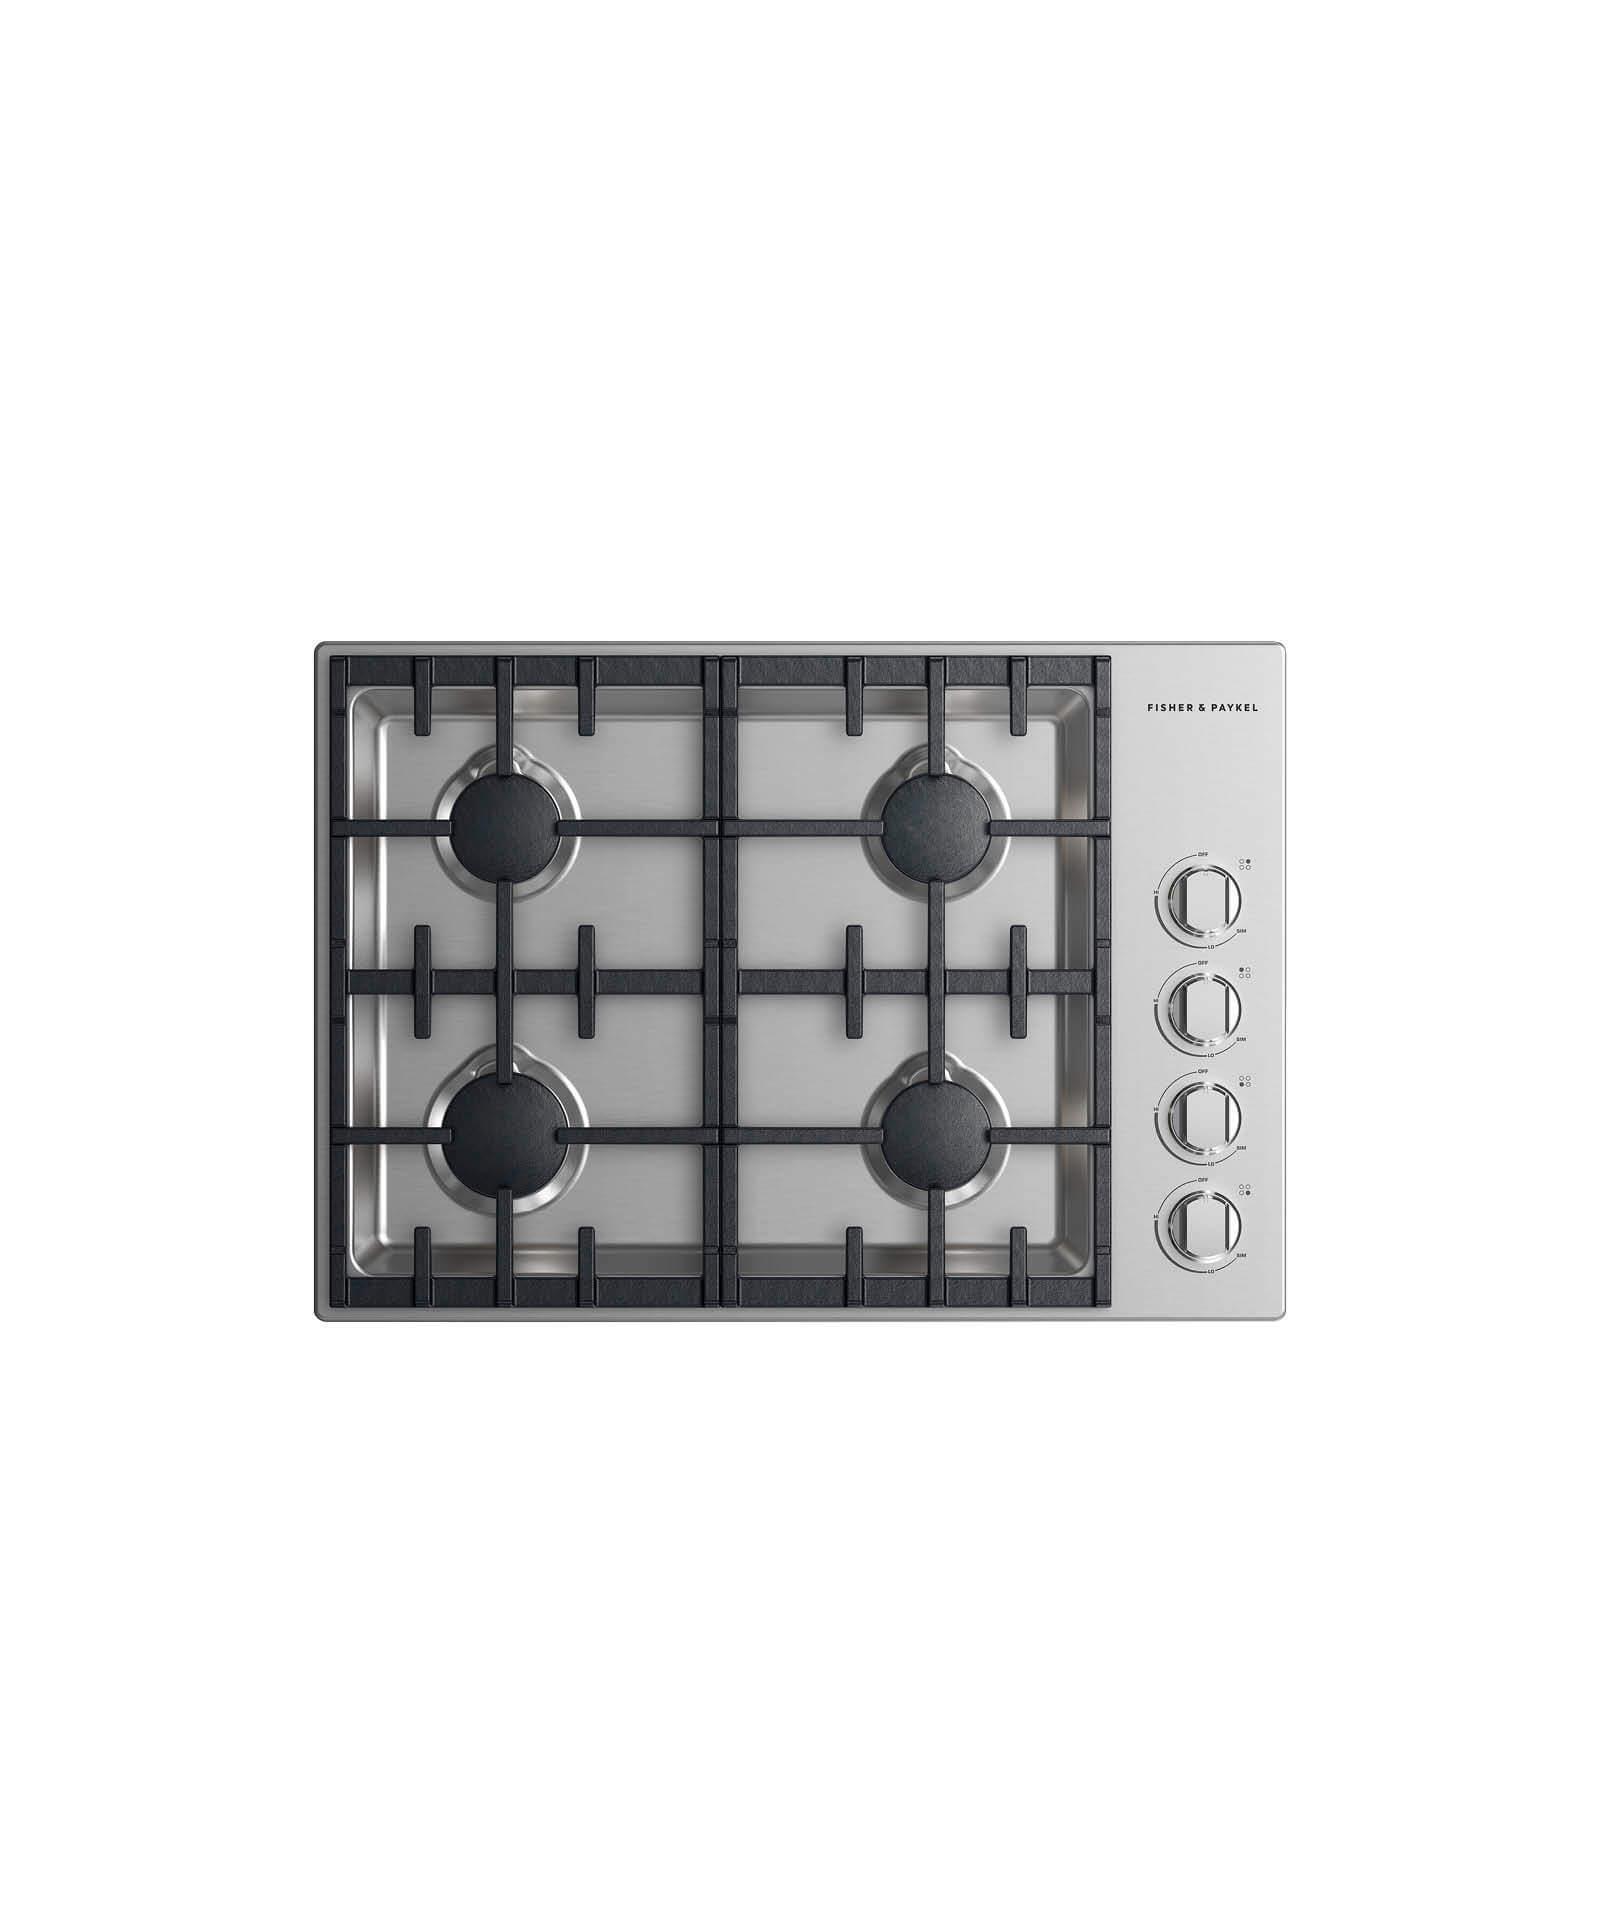 "Model: CDV2-304H-L_N | Fisher and Paykel Gas Cooktop 30"", 4 burner (LPG)"